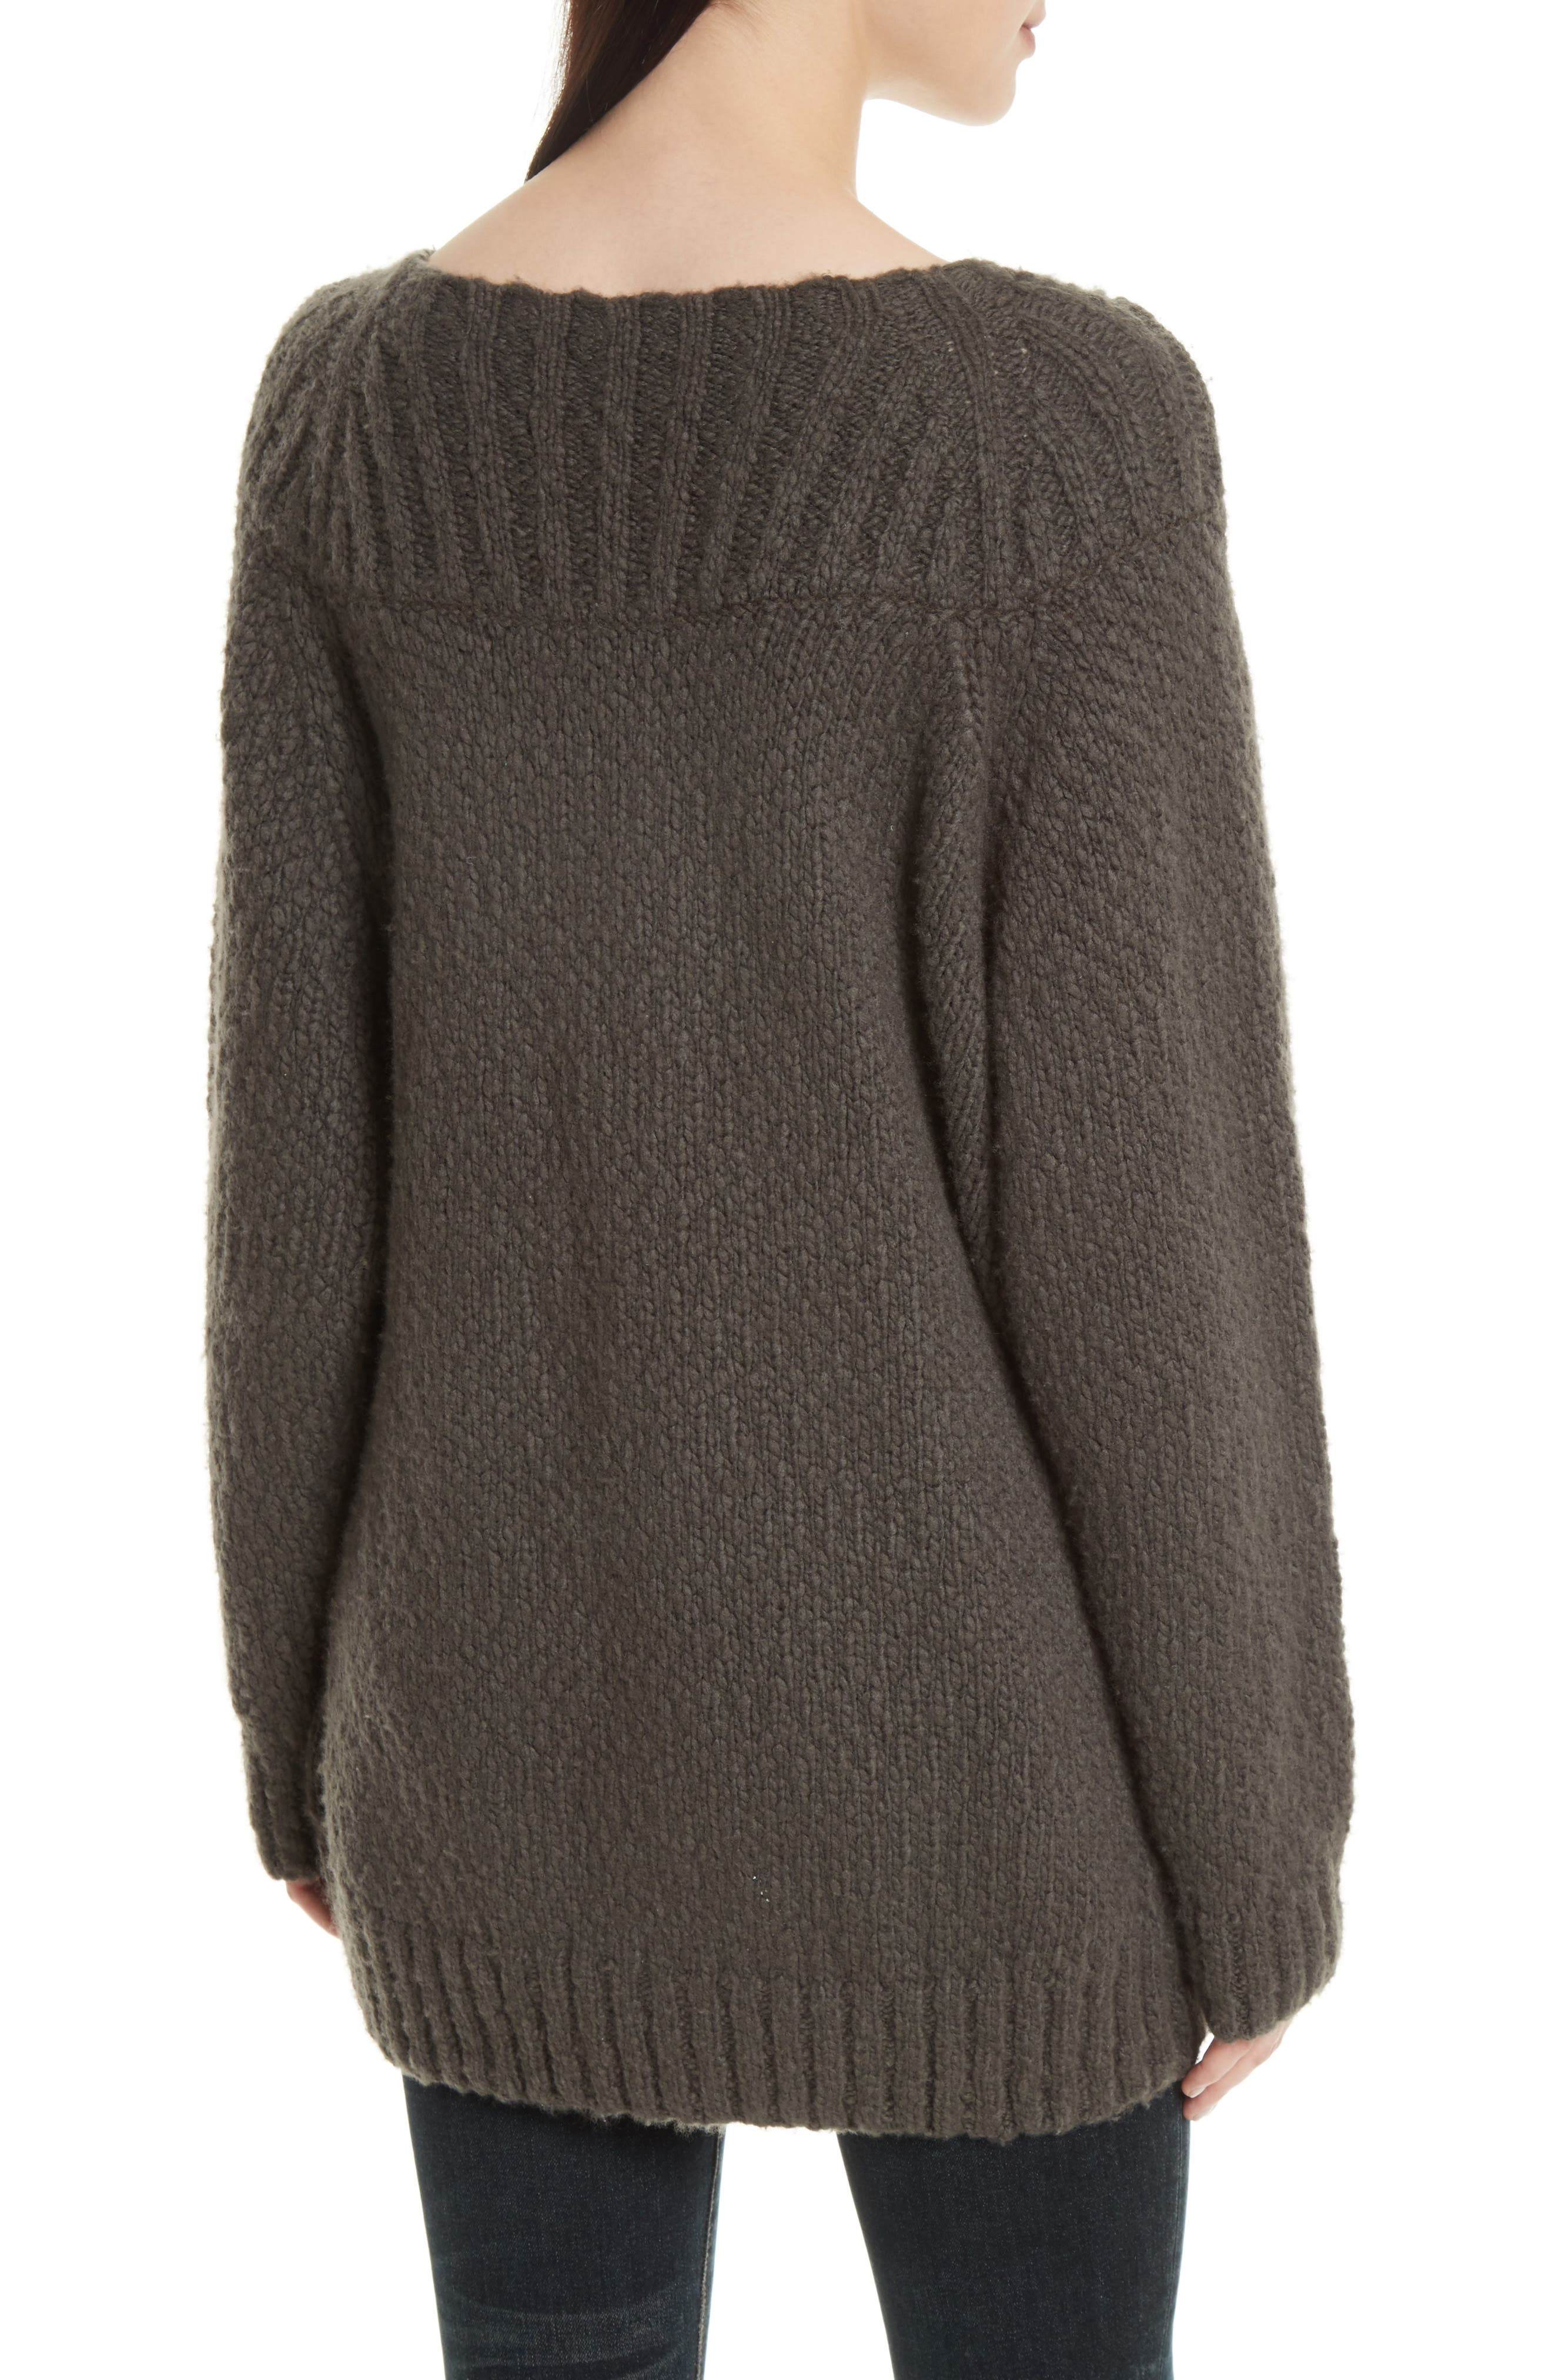 Ribbed Yoke Knit Sweater,                             Alternate thumbnail 2, color,                             082